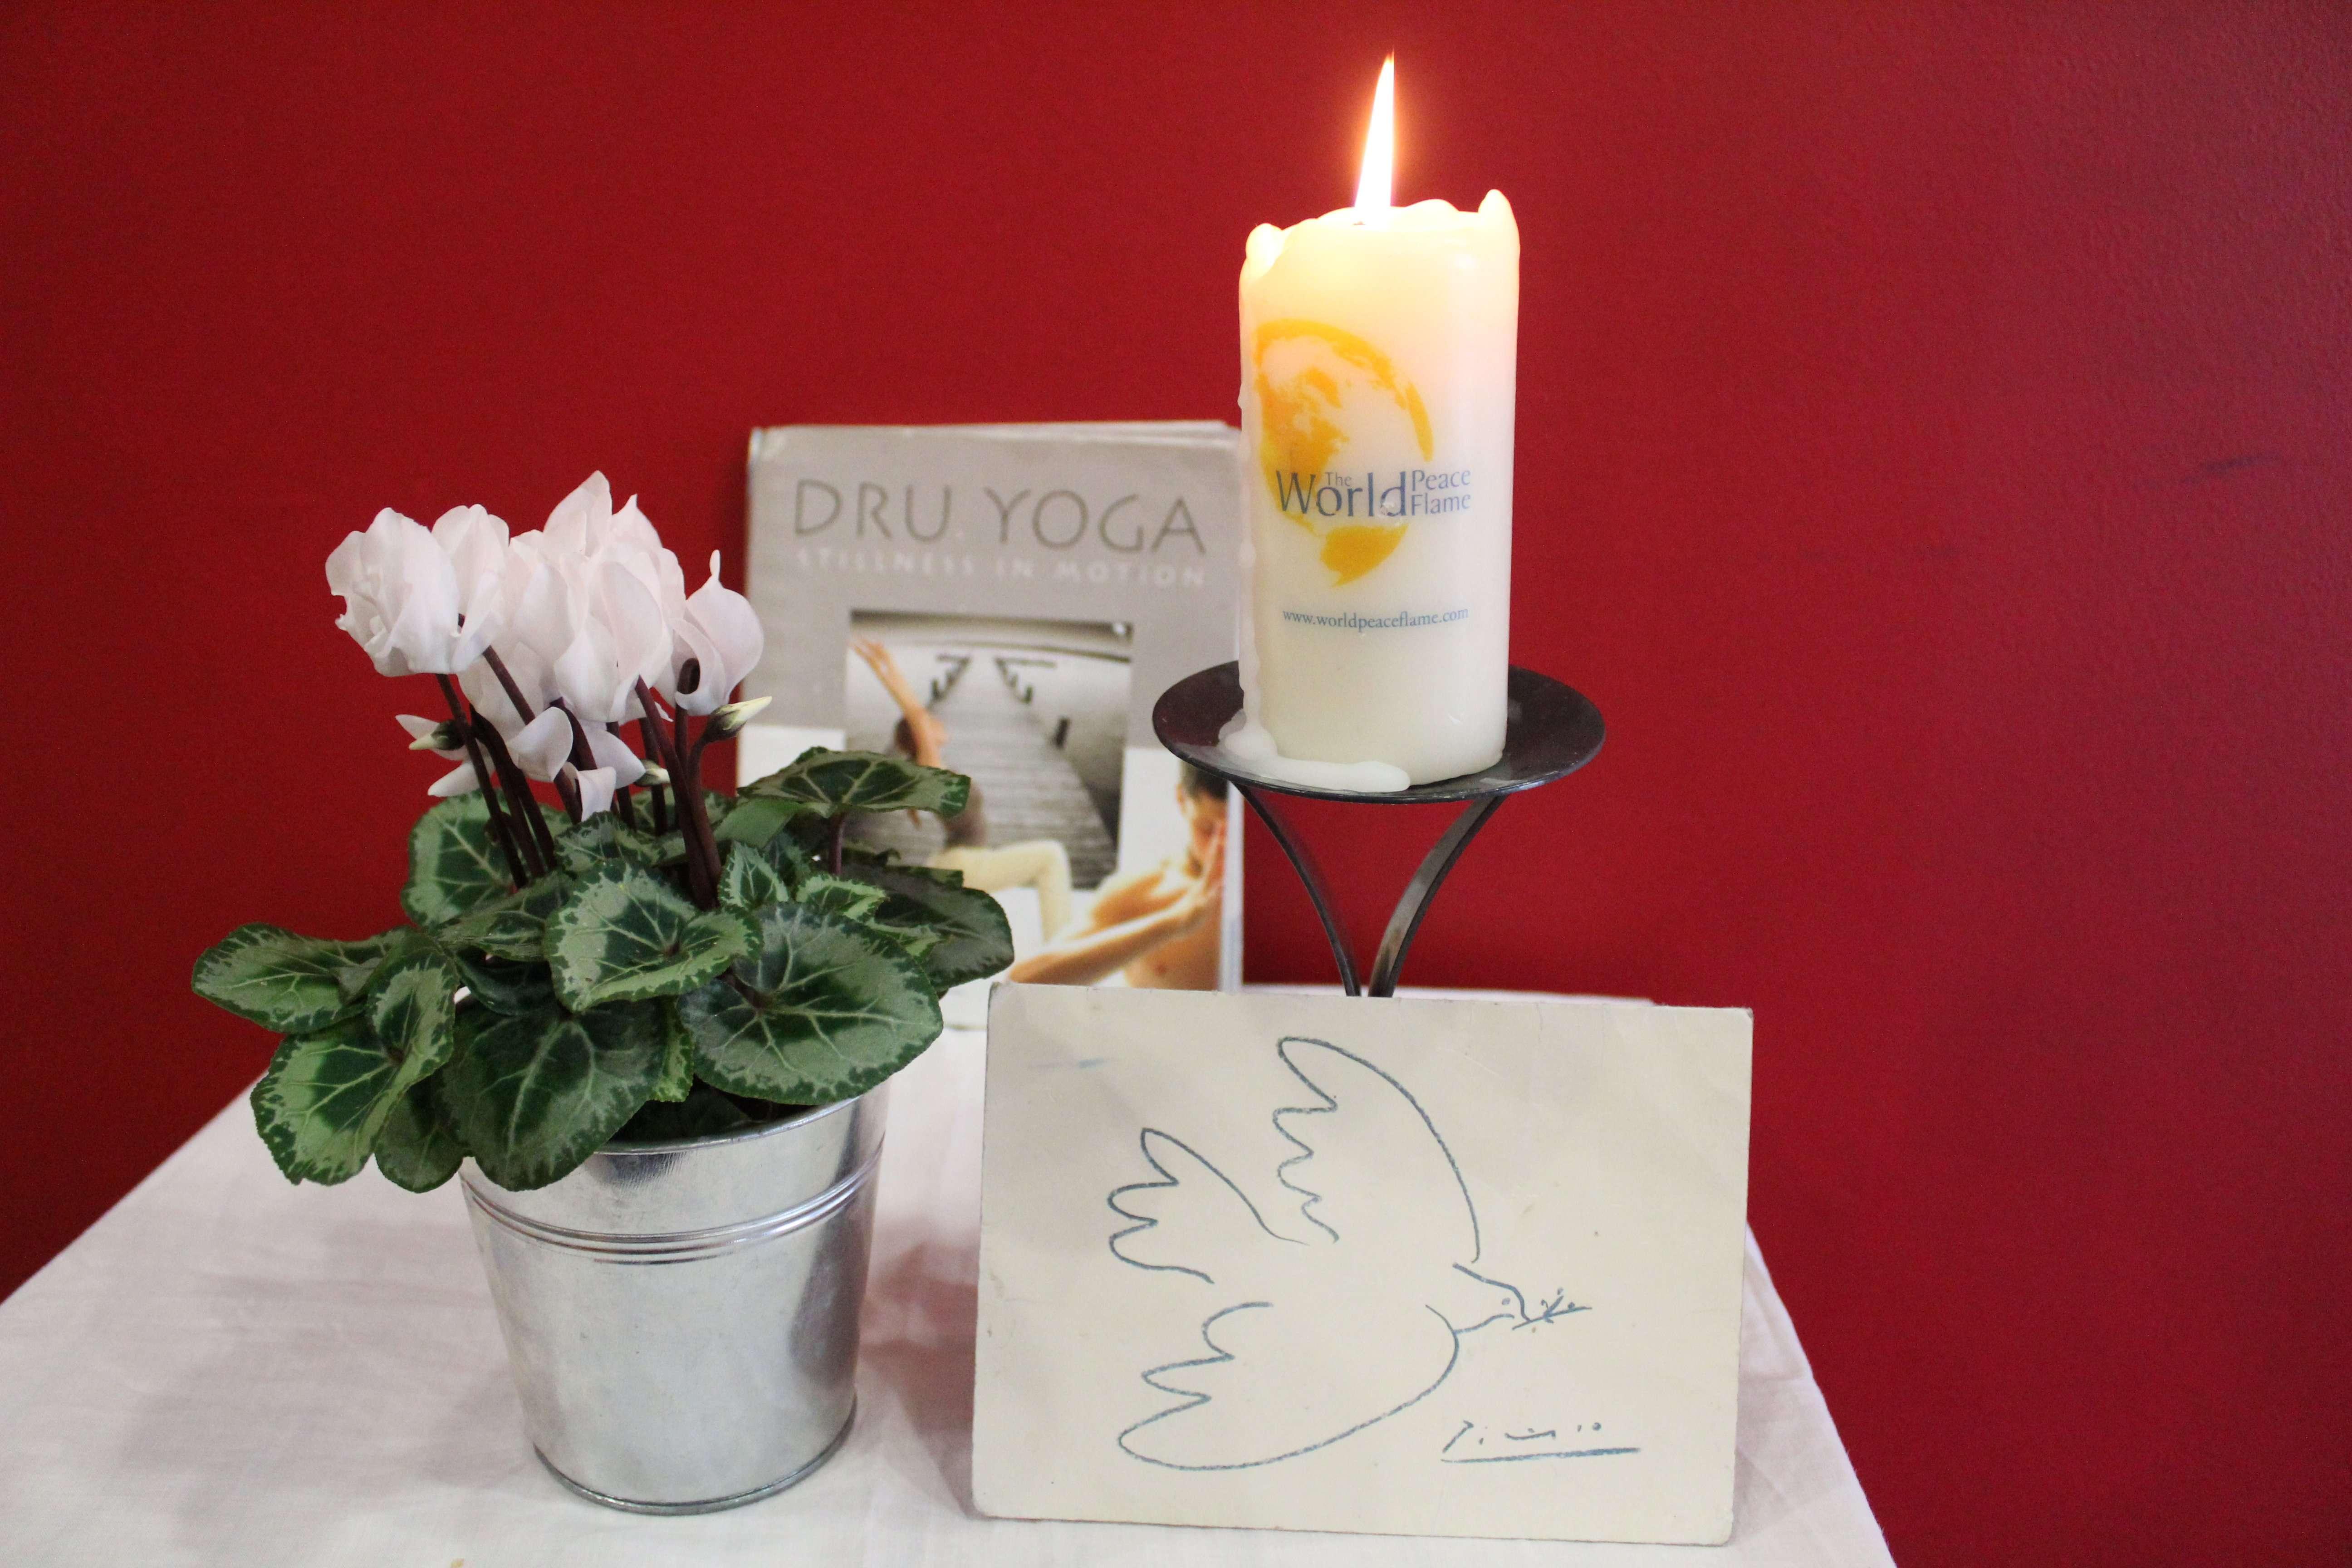 Dru Yoga with Gillian